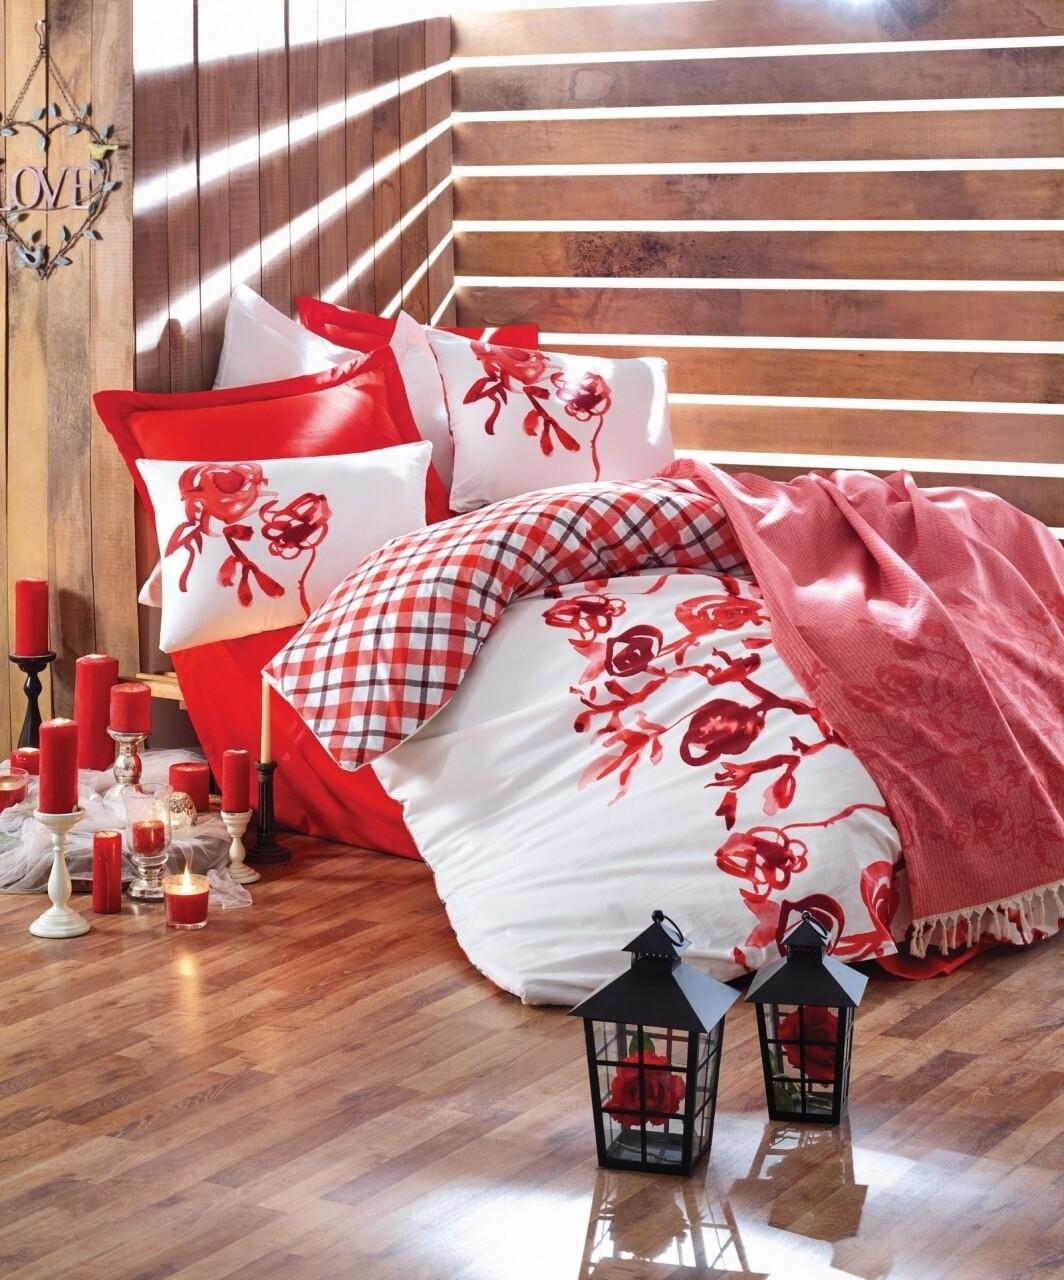 Set lenjerie de pat dubla Scarlet + pled dublu, Cotton Box, 4 piese, 220 x 230 cm, 100% bumbac ranforce, alb/rosu